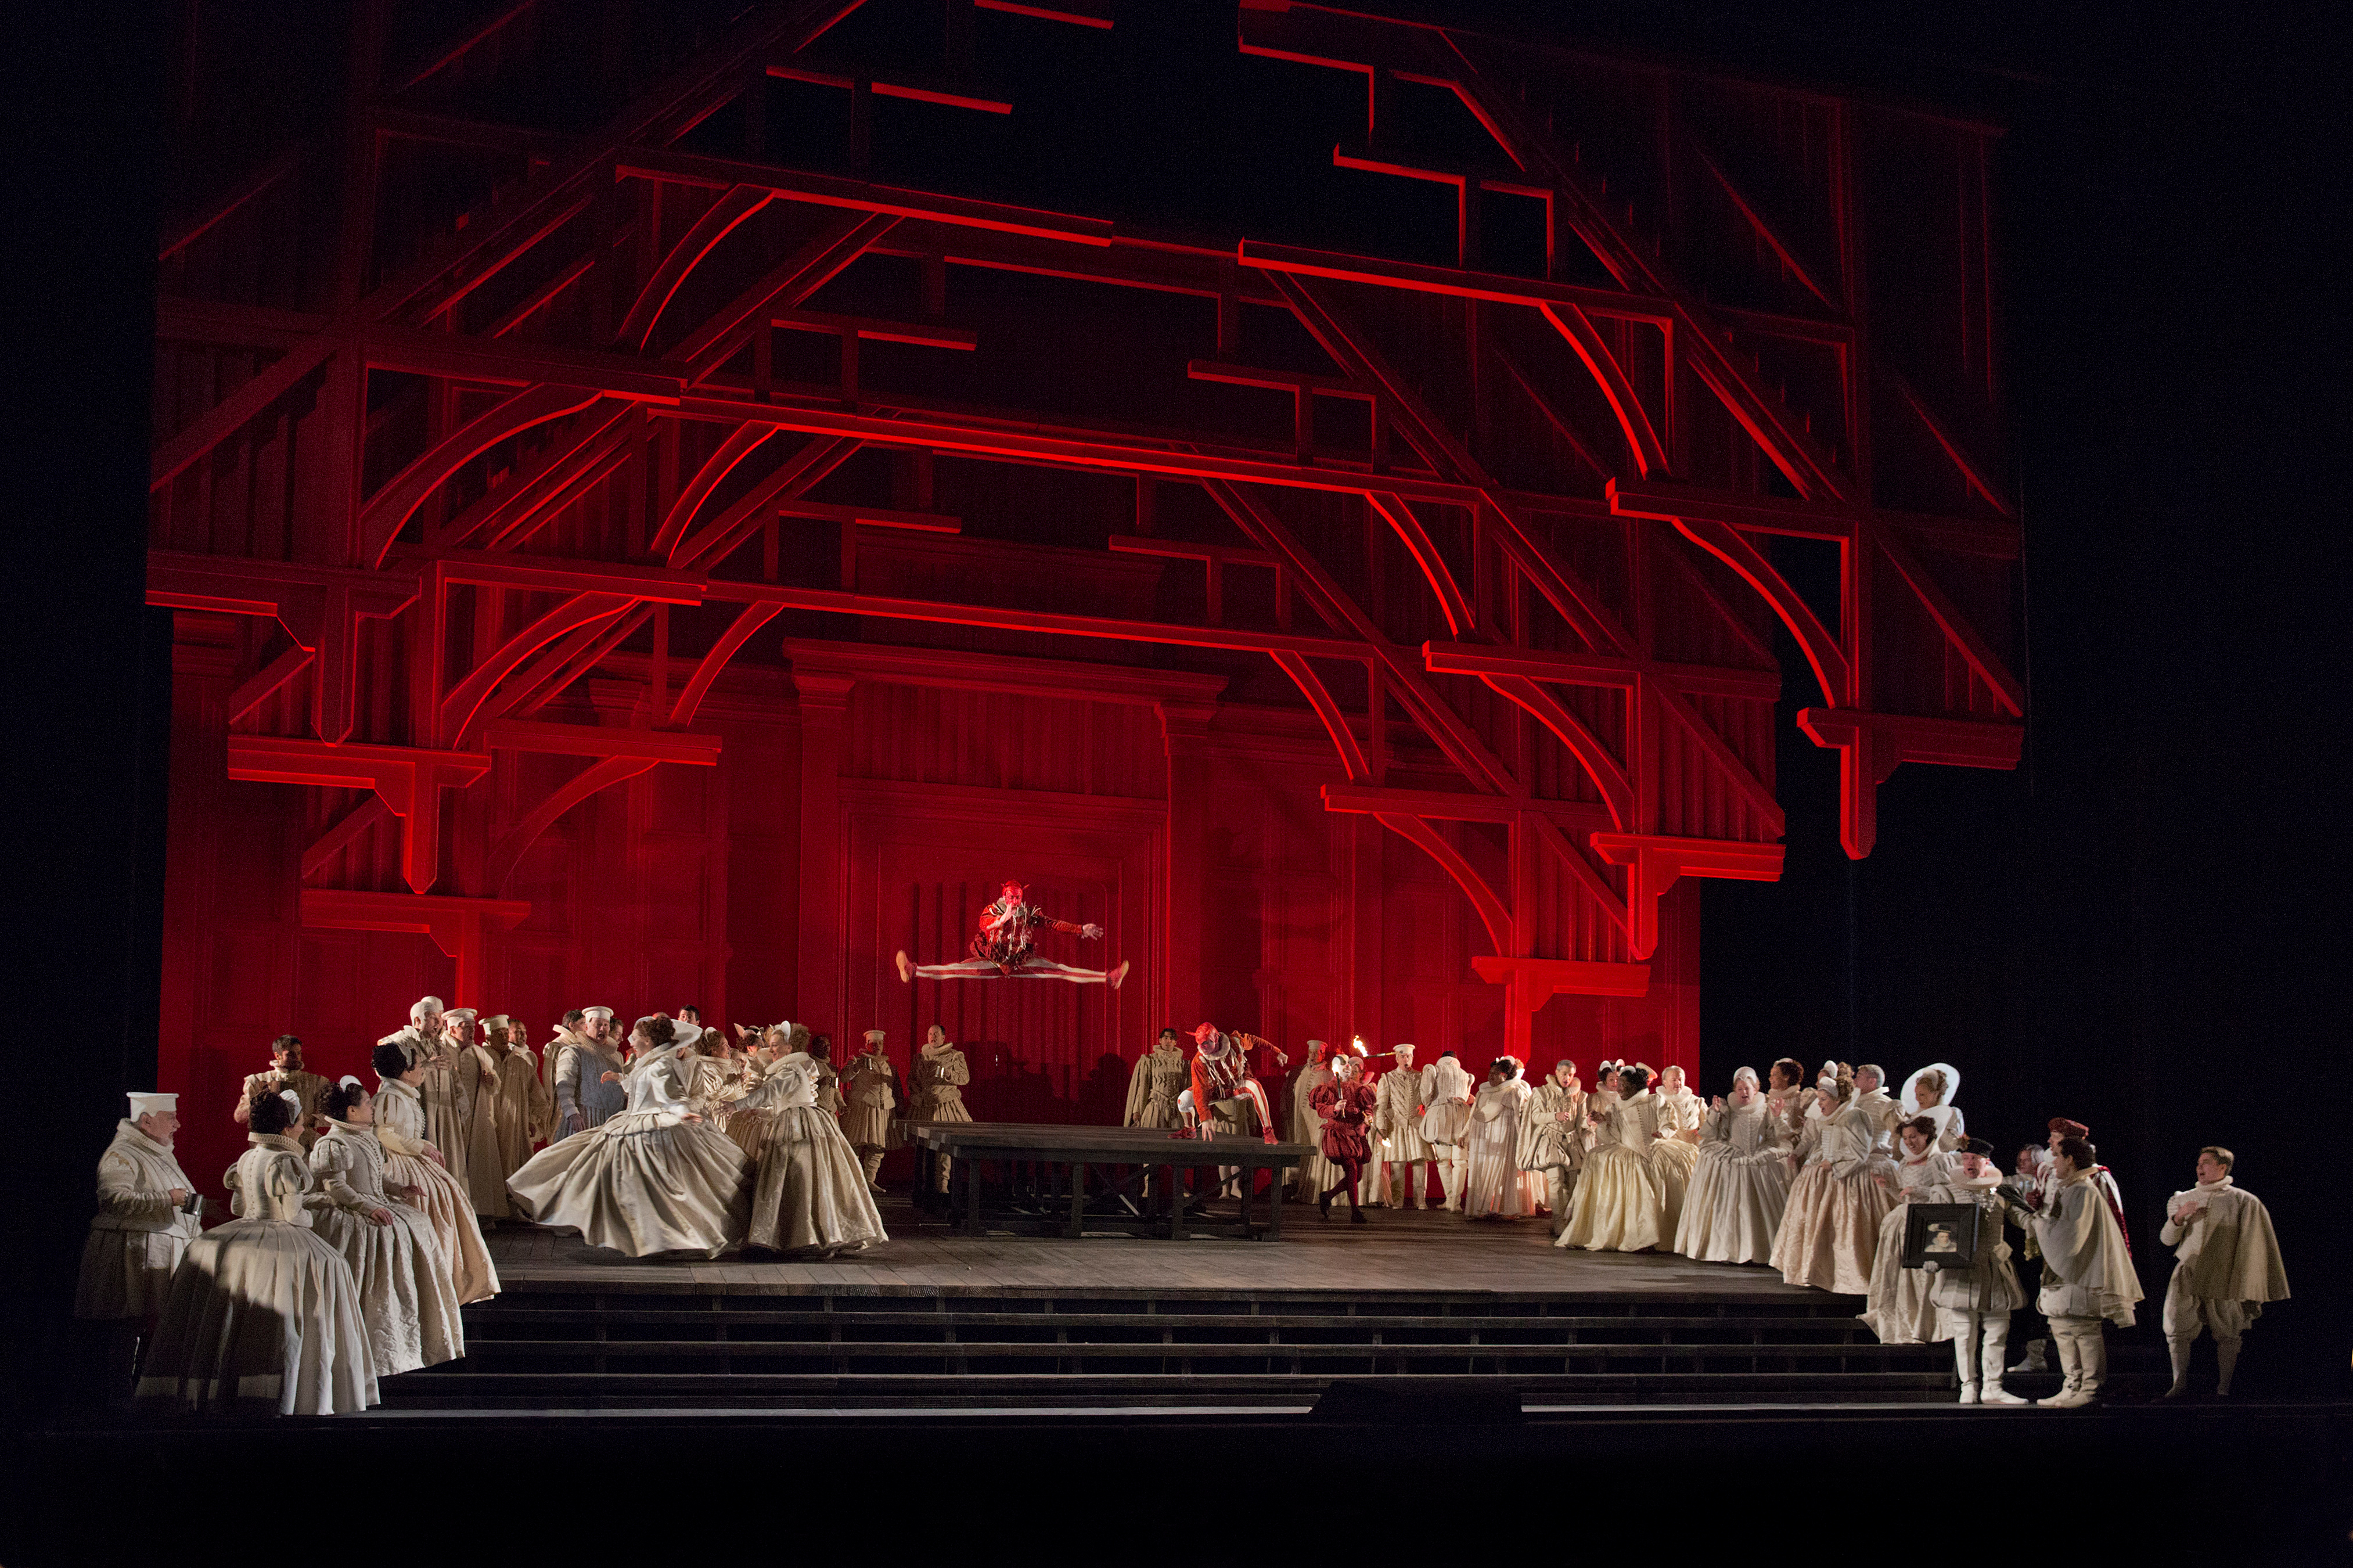 Metropolitan Opera - Maria Stuarda